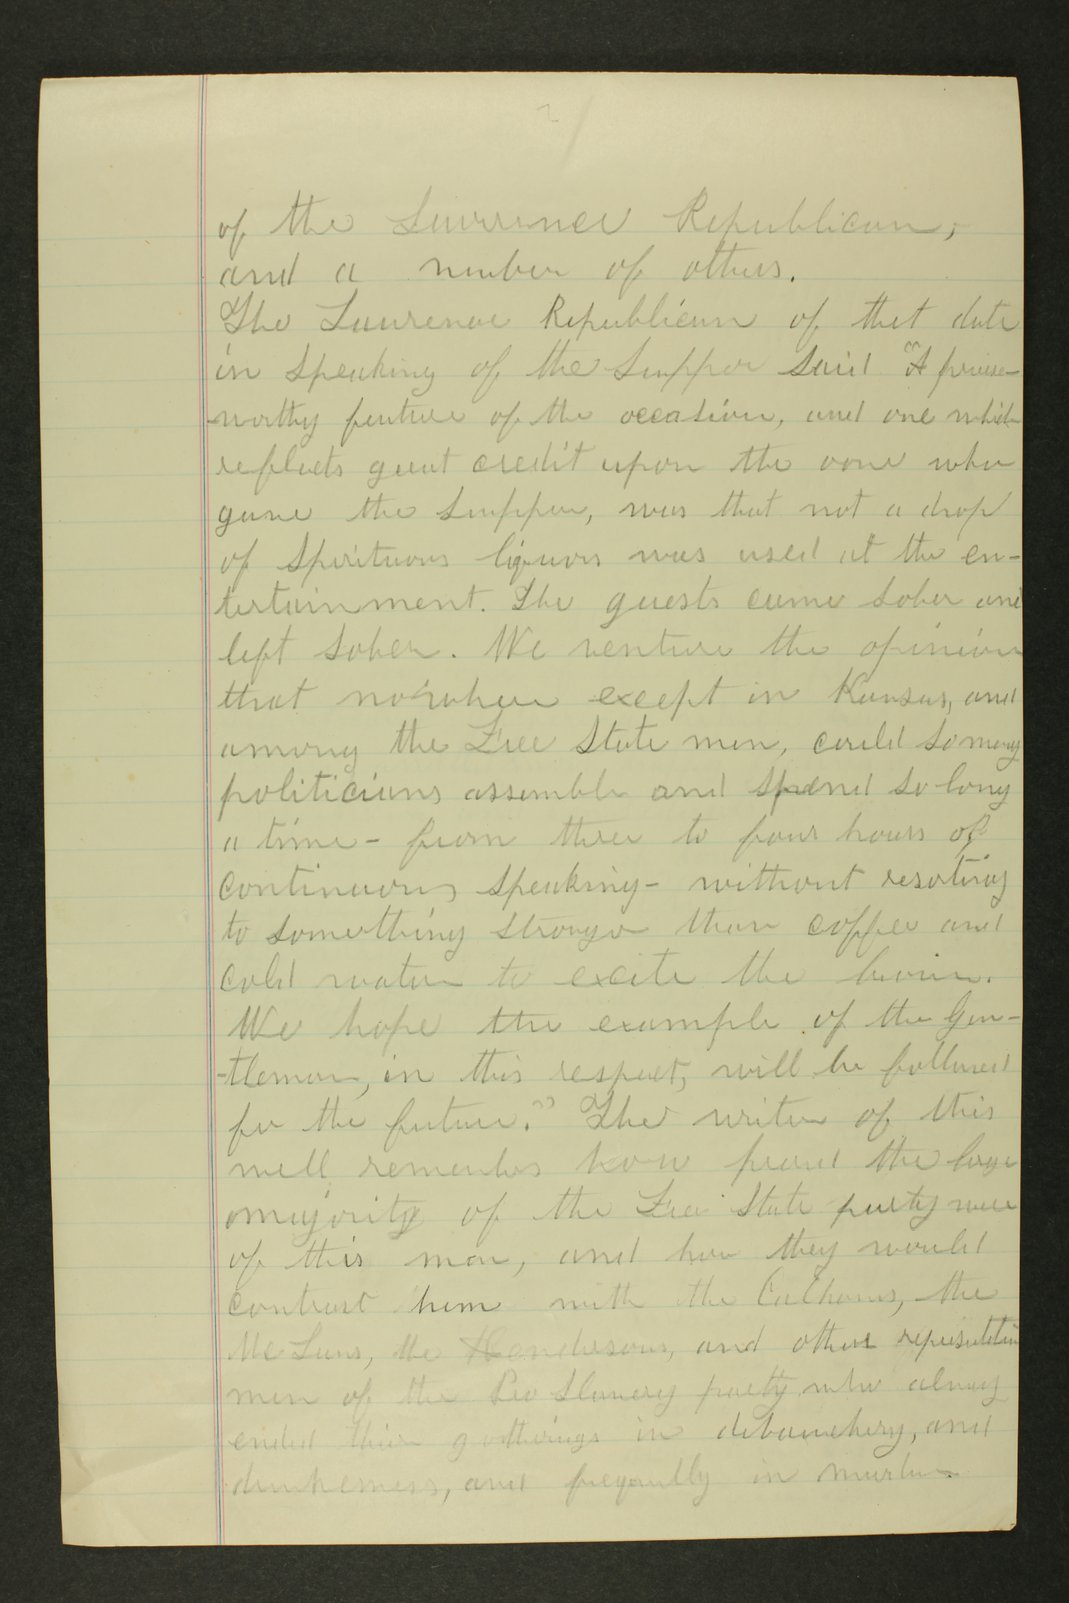 Temperance history correspondence - 8